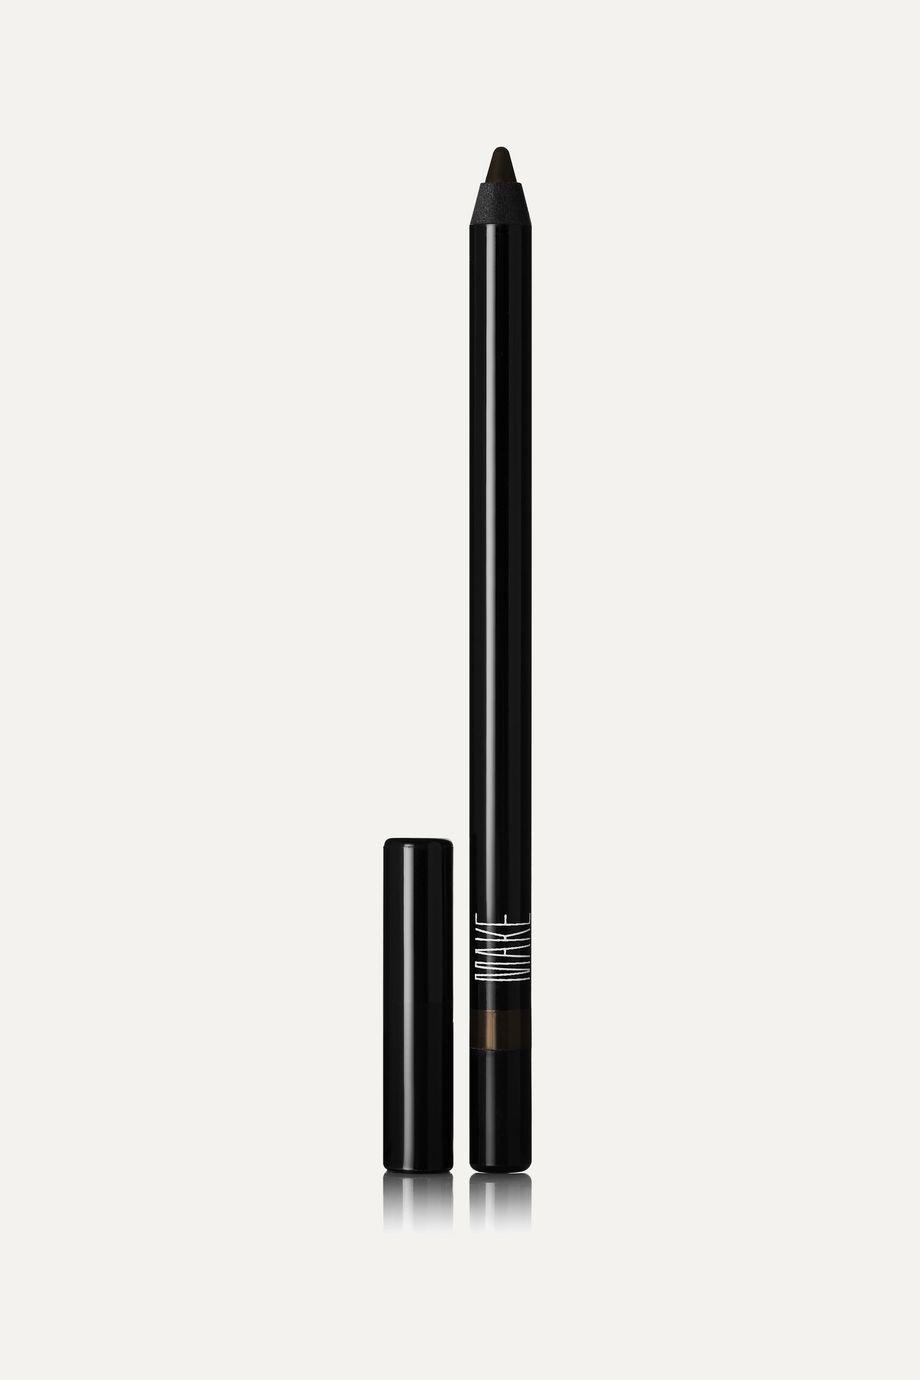 MAKE Beauty Gel Eyeliner Pencil - Espresso Brown